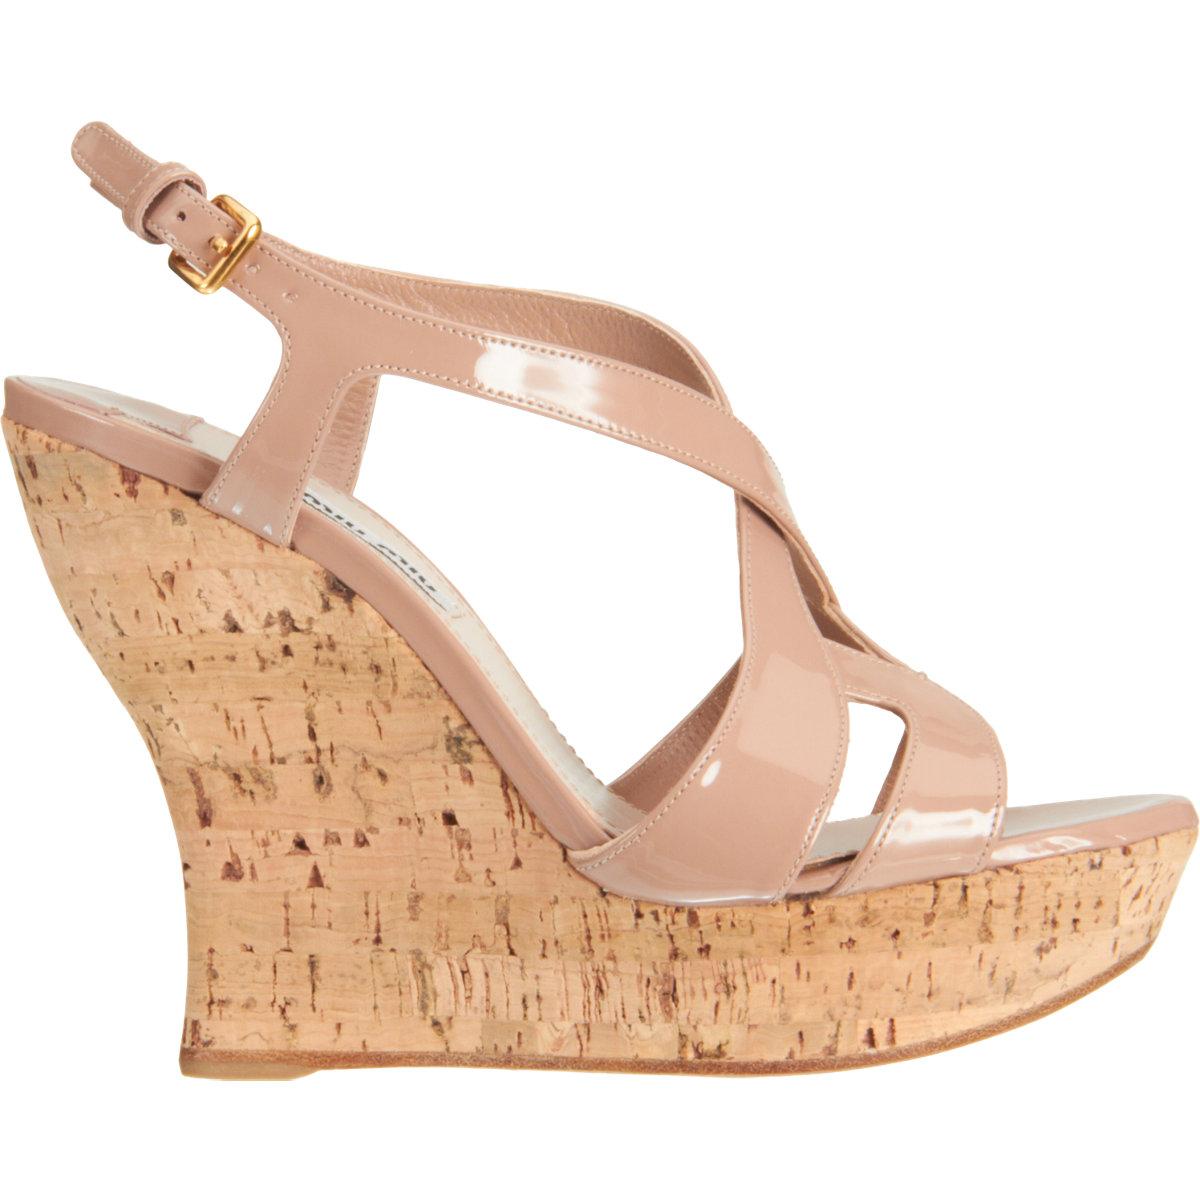 3c9bc30e92c4 Miu Miu Cutout Slingback Wedge Sandal in Natural - Lyst